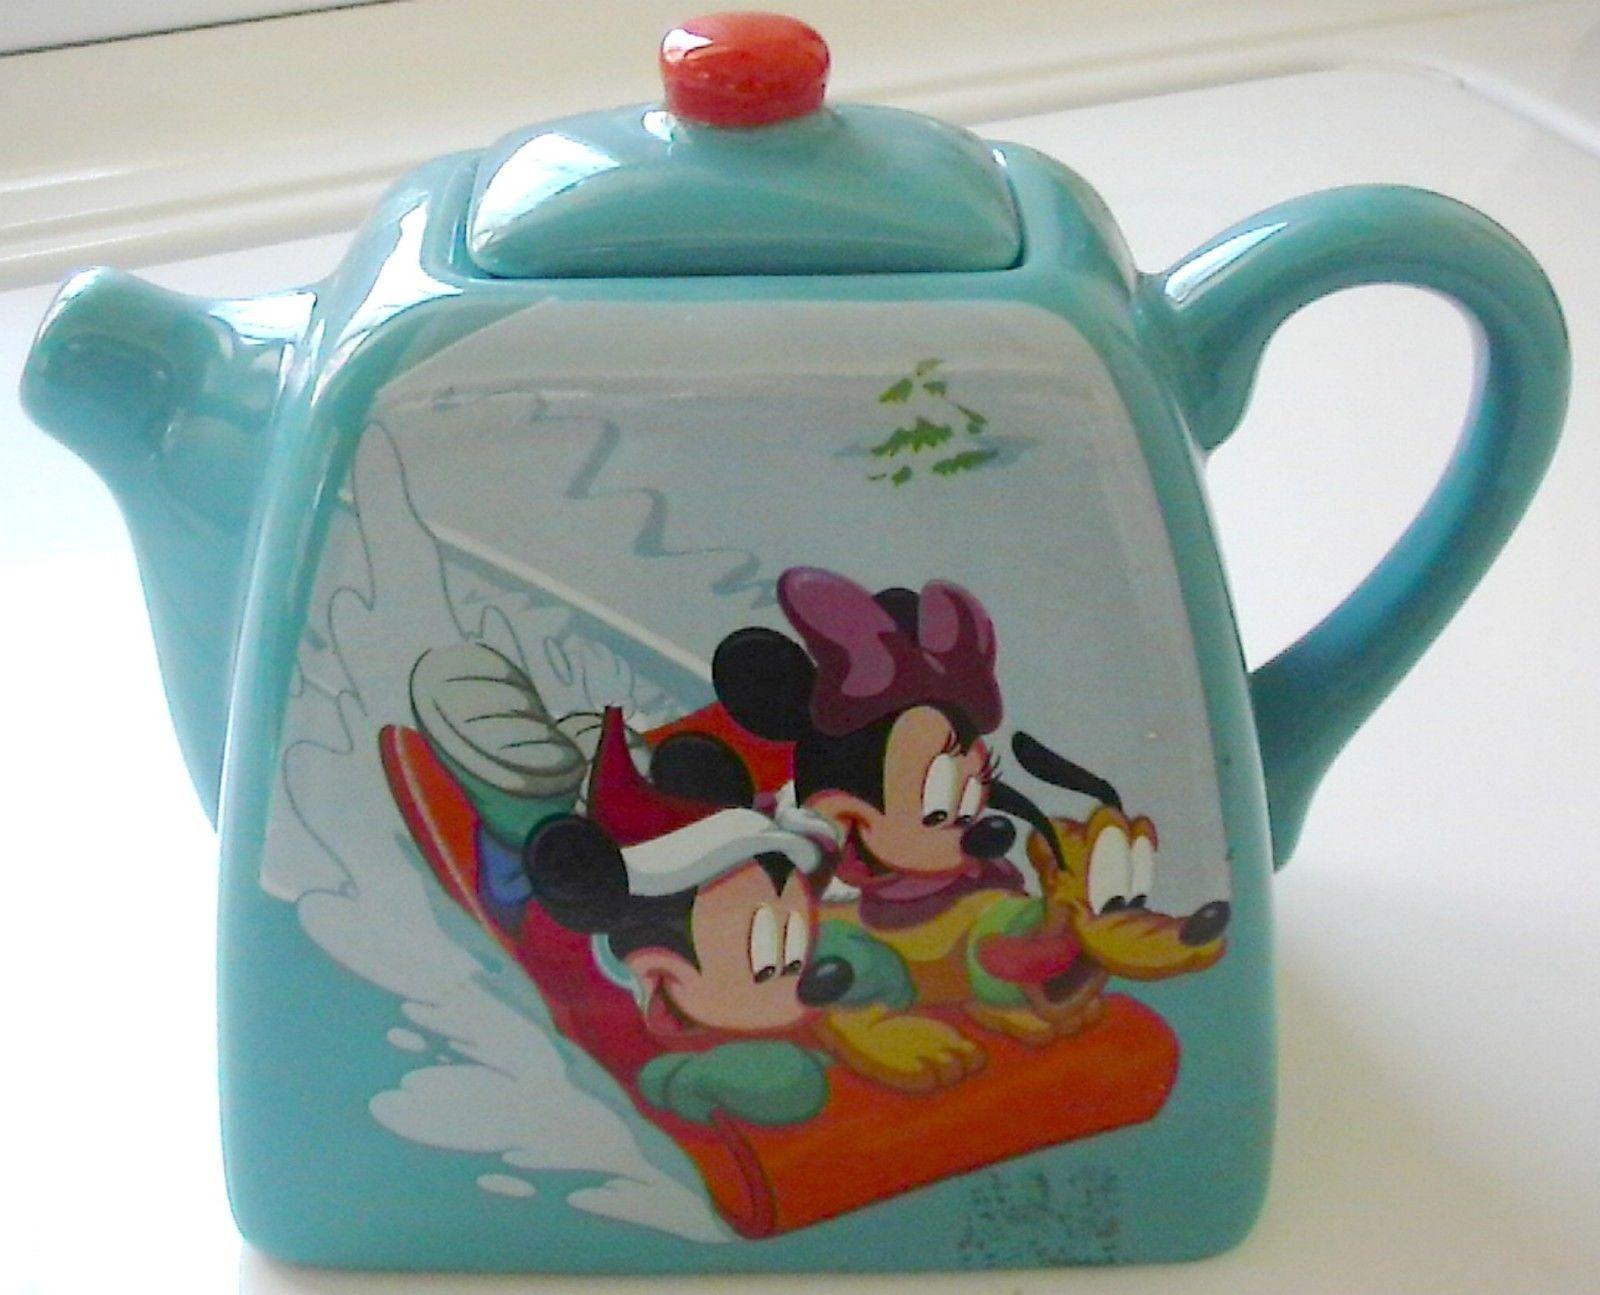 Retro Turquoise Disney Mickey Minnie Mouse Pluto Sled Ceramic Aqua Tea Pot Lid Minnie Mouse Mug Tea Pots Disney Mickey